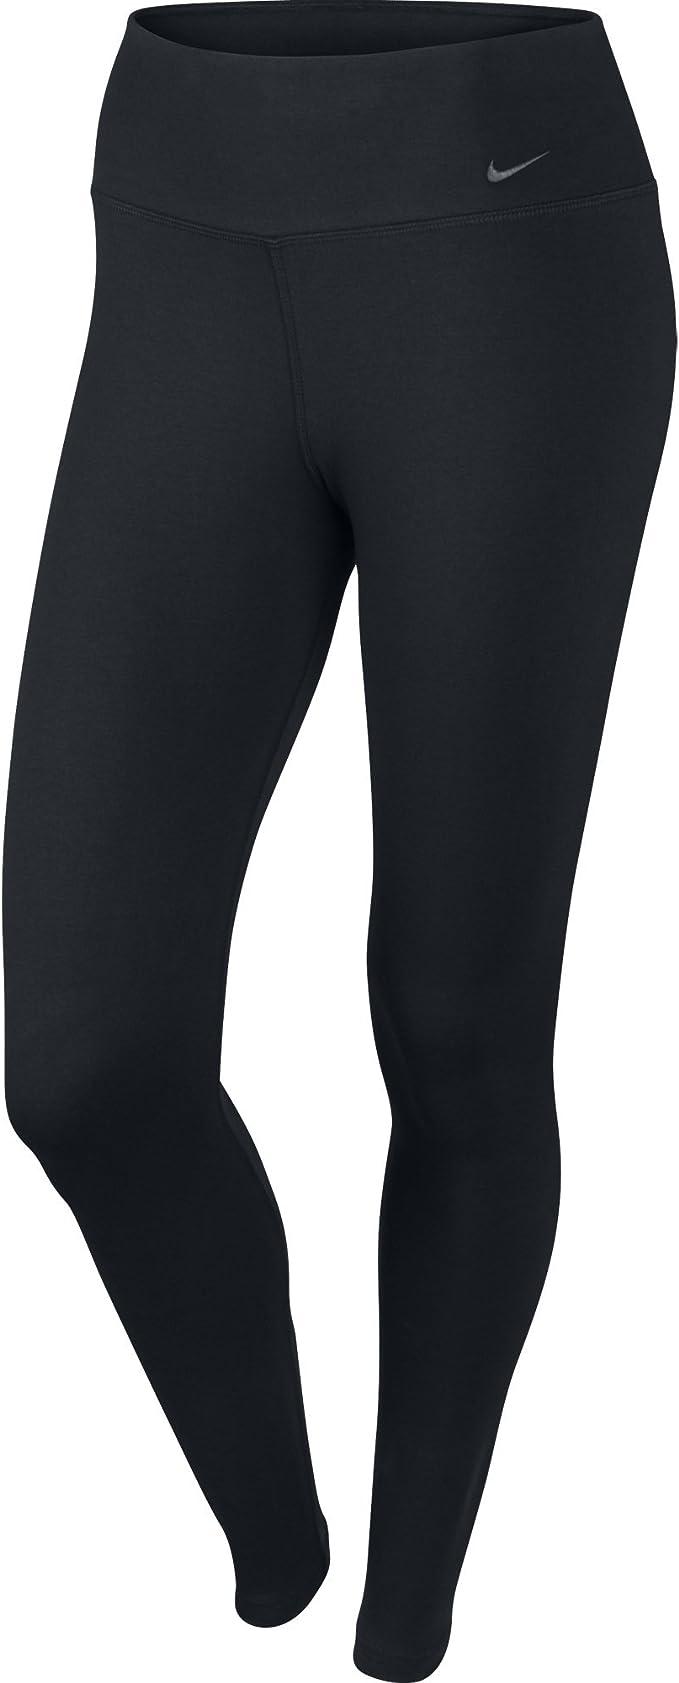 Nike Legend 2.0 Poly Running Tights, Black/Cool Grey